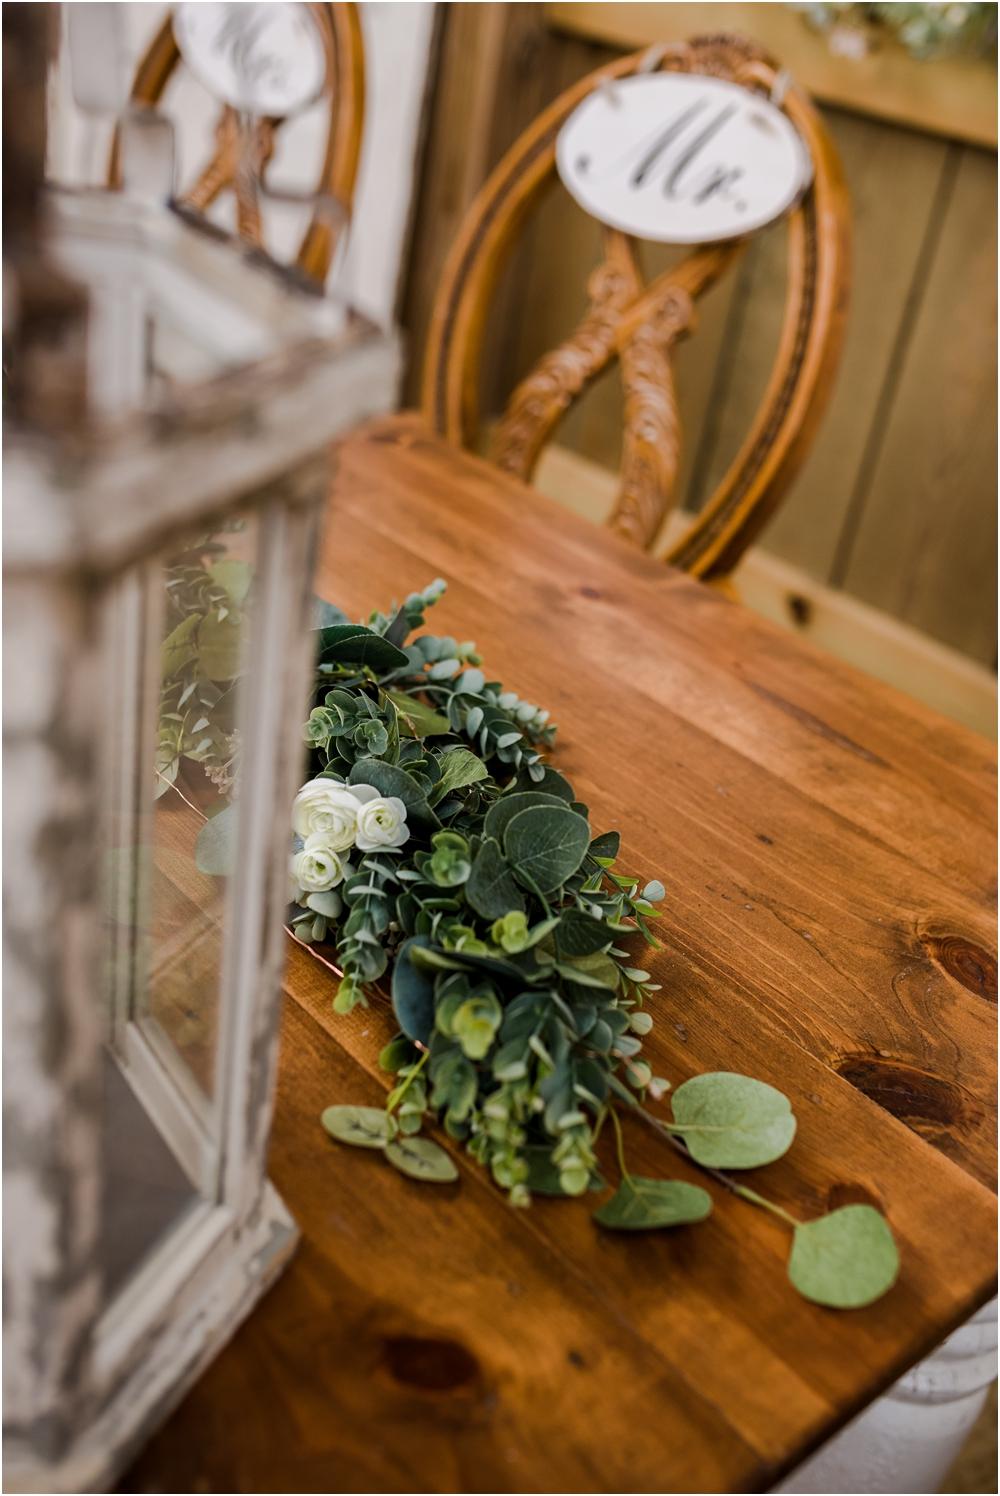 mosley-wedding-kiersten-stevenson-photography-30a-panama-city-beach-dothan-tallahassee-(30-of-472).JPG